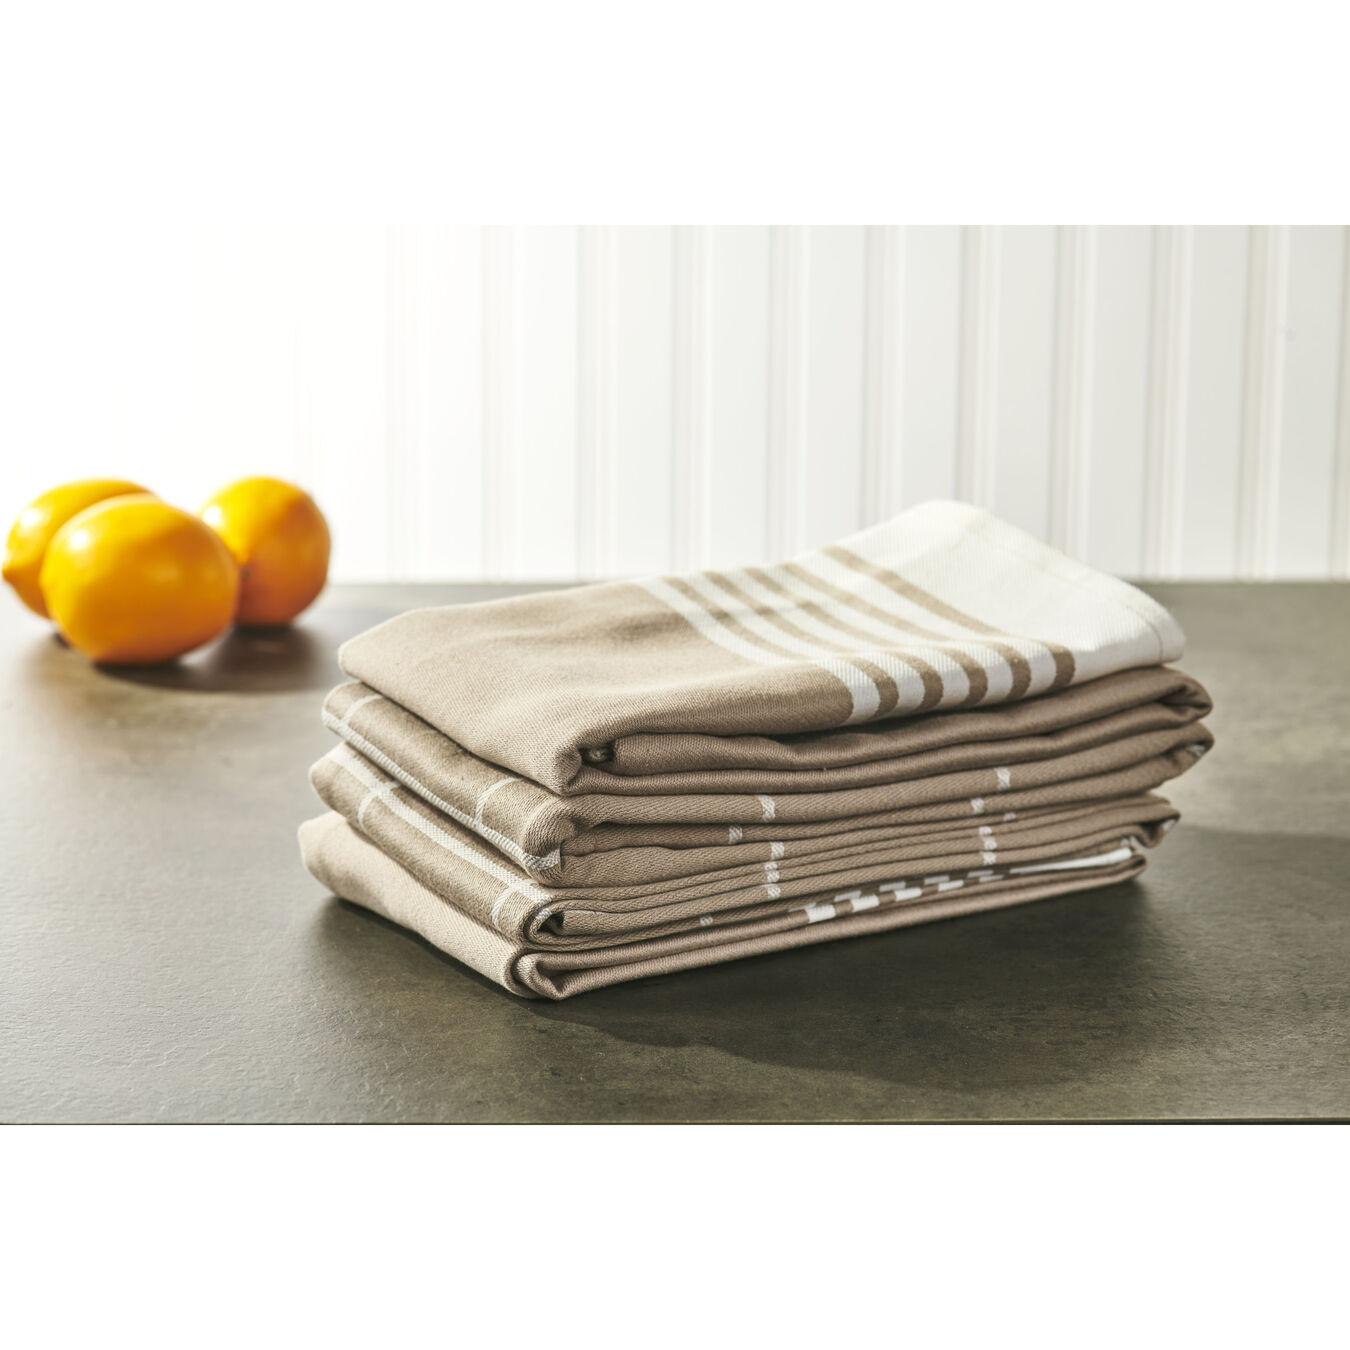 4-pc Kitchen Towel Set - Taupe,,large 4